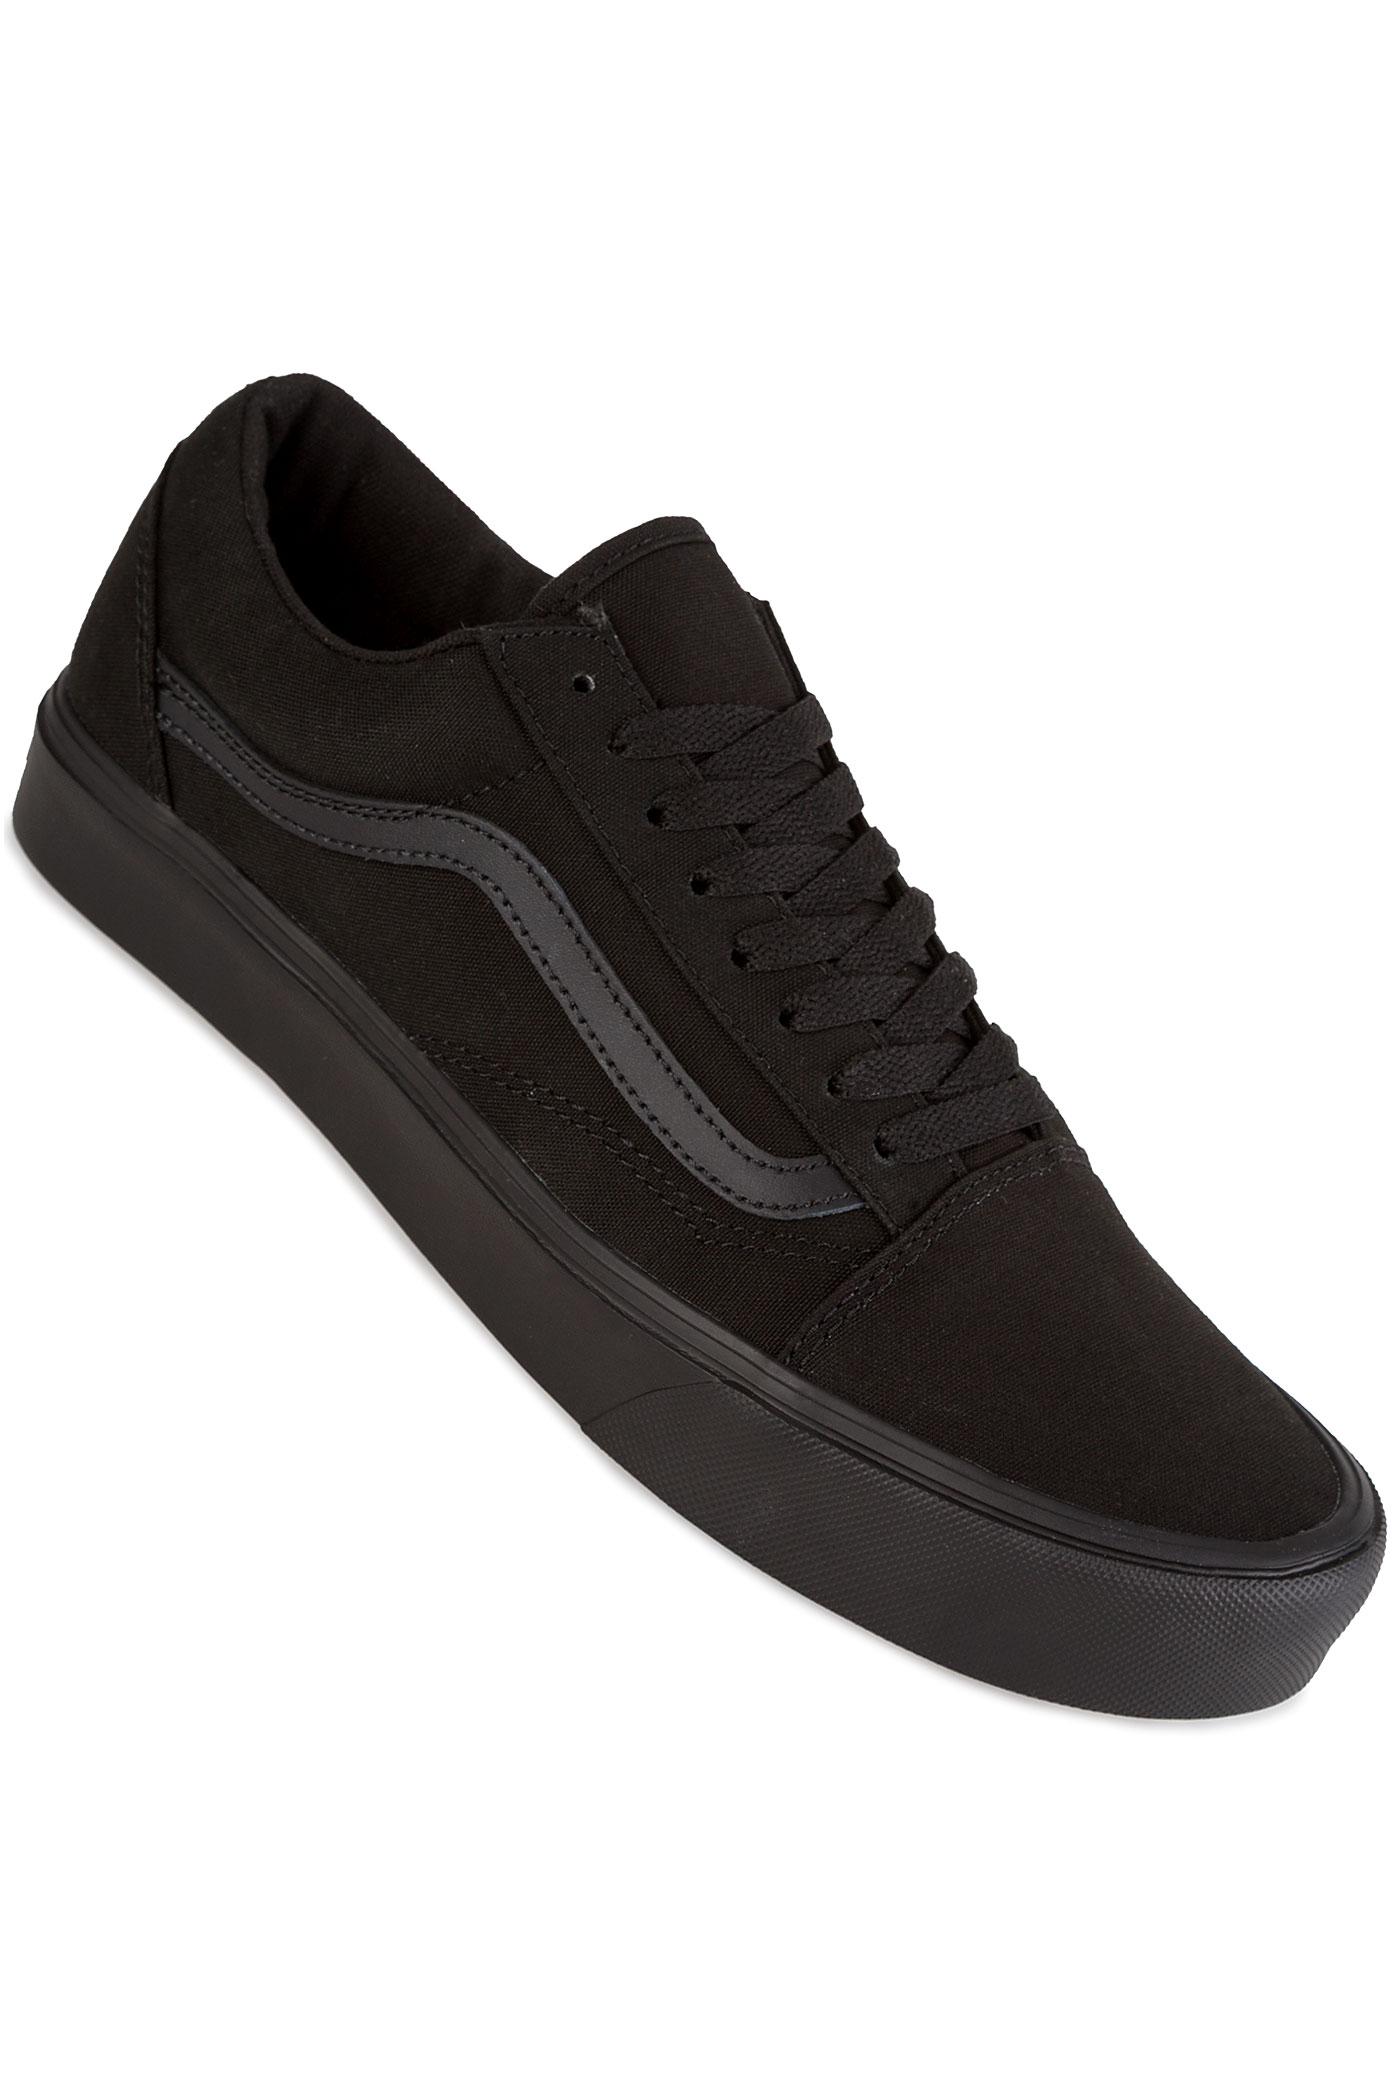 vans old skool lite canvas chaussure black black achetez. Black Bedroom Furniture Sets. Home Design Ideas